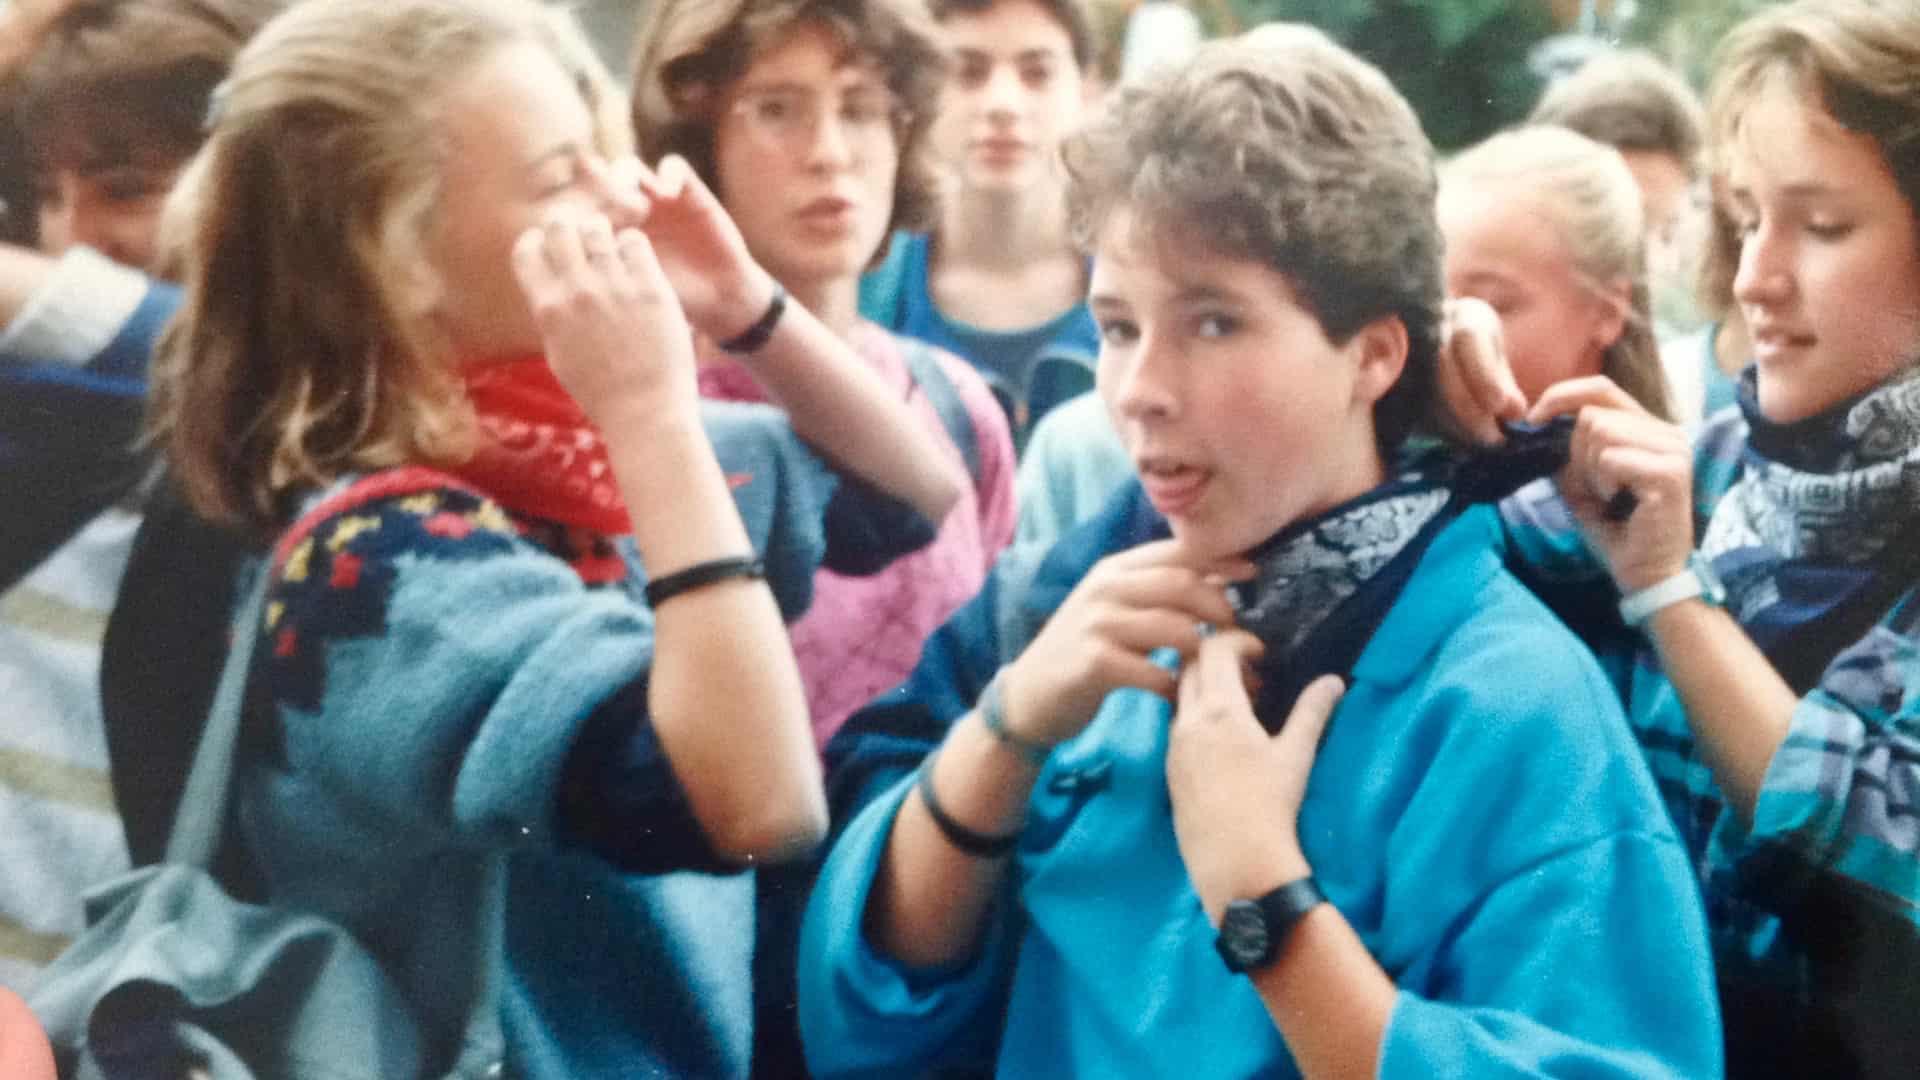 Projektwoche: Szene aus den 80ern (Archivbild)